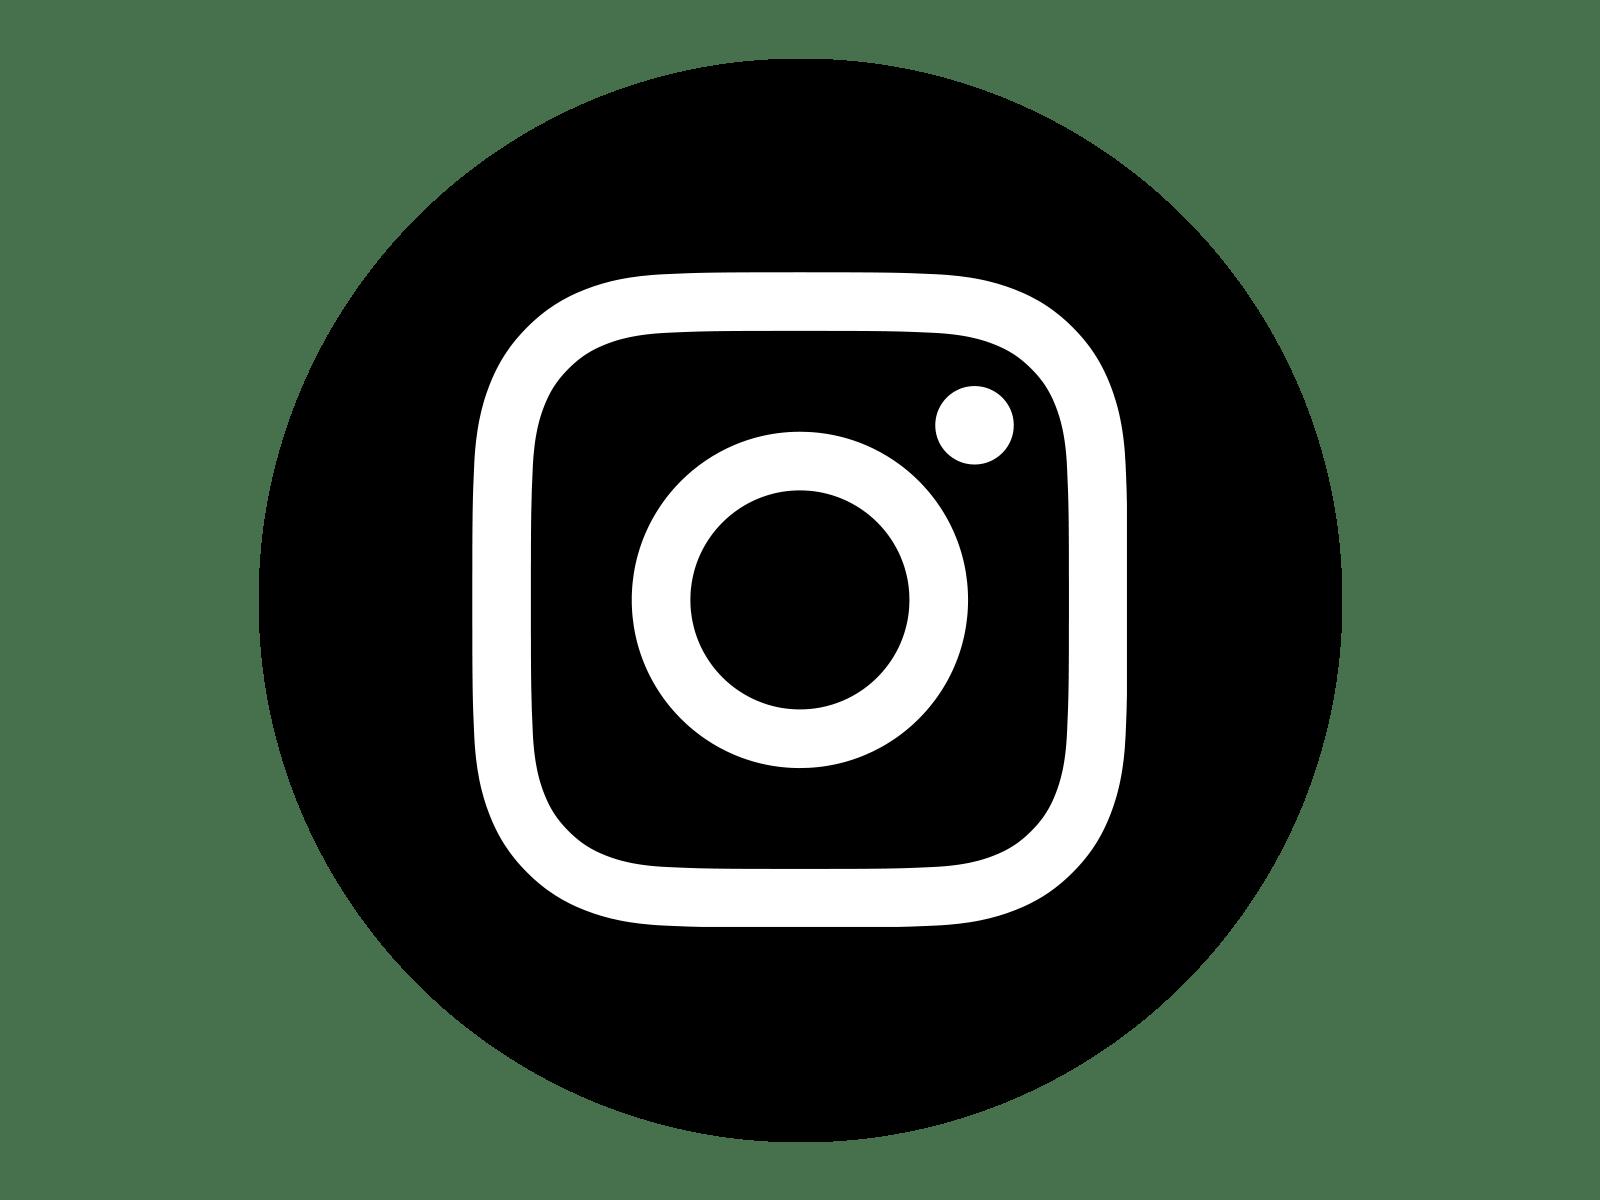 instagram-icon-white-on-black-circle - Travel Off Path